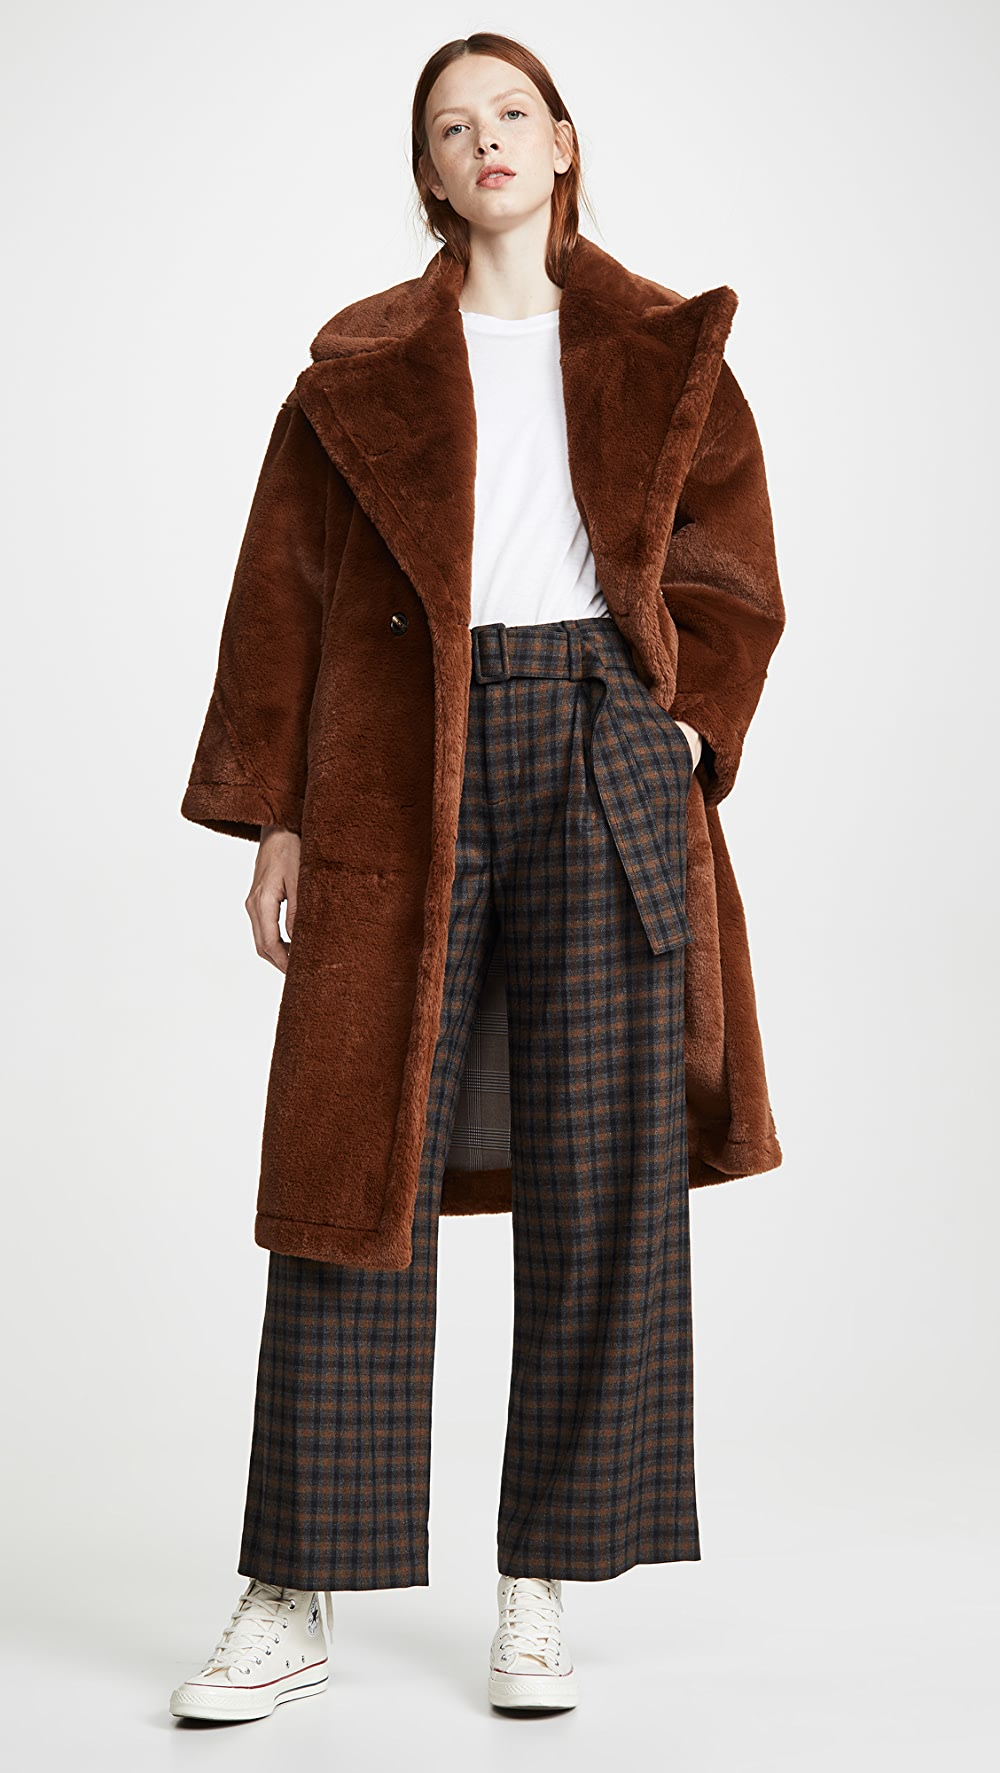 Objective Line - Alyson Jacket Exquisite Craftsmanship;